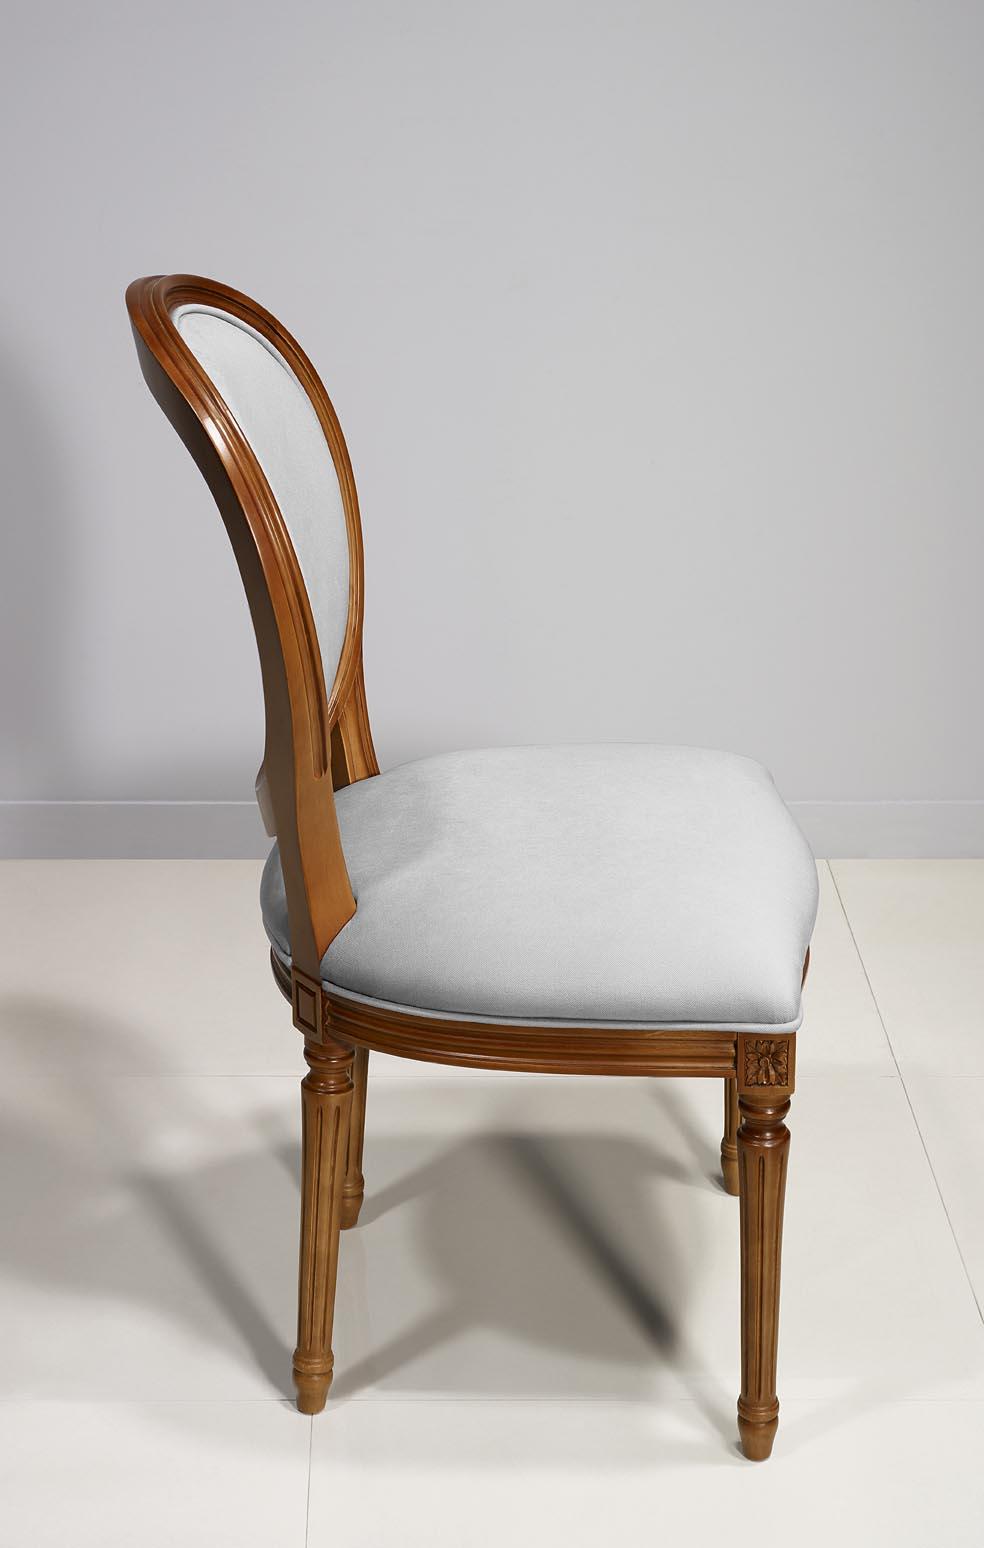 chaise emeline en merisier massif de style louis xvi meuble en merisier massif. Black Bedroom Furniture Sets. Home Design Ideas